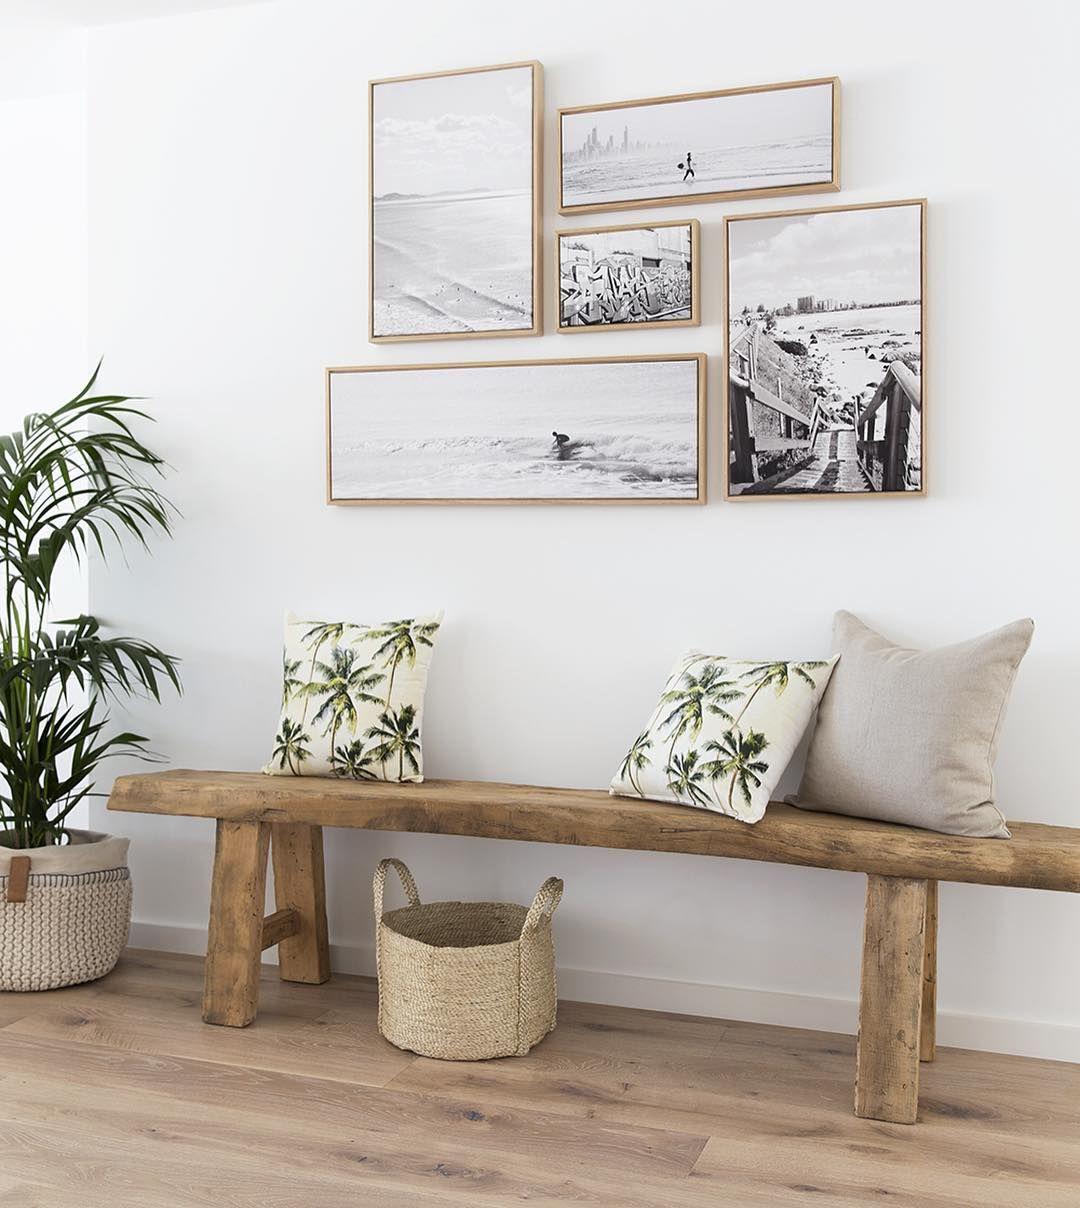 Coastal And White Casually Simple Elegance Interior  # Muebles Simon Marbella